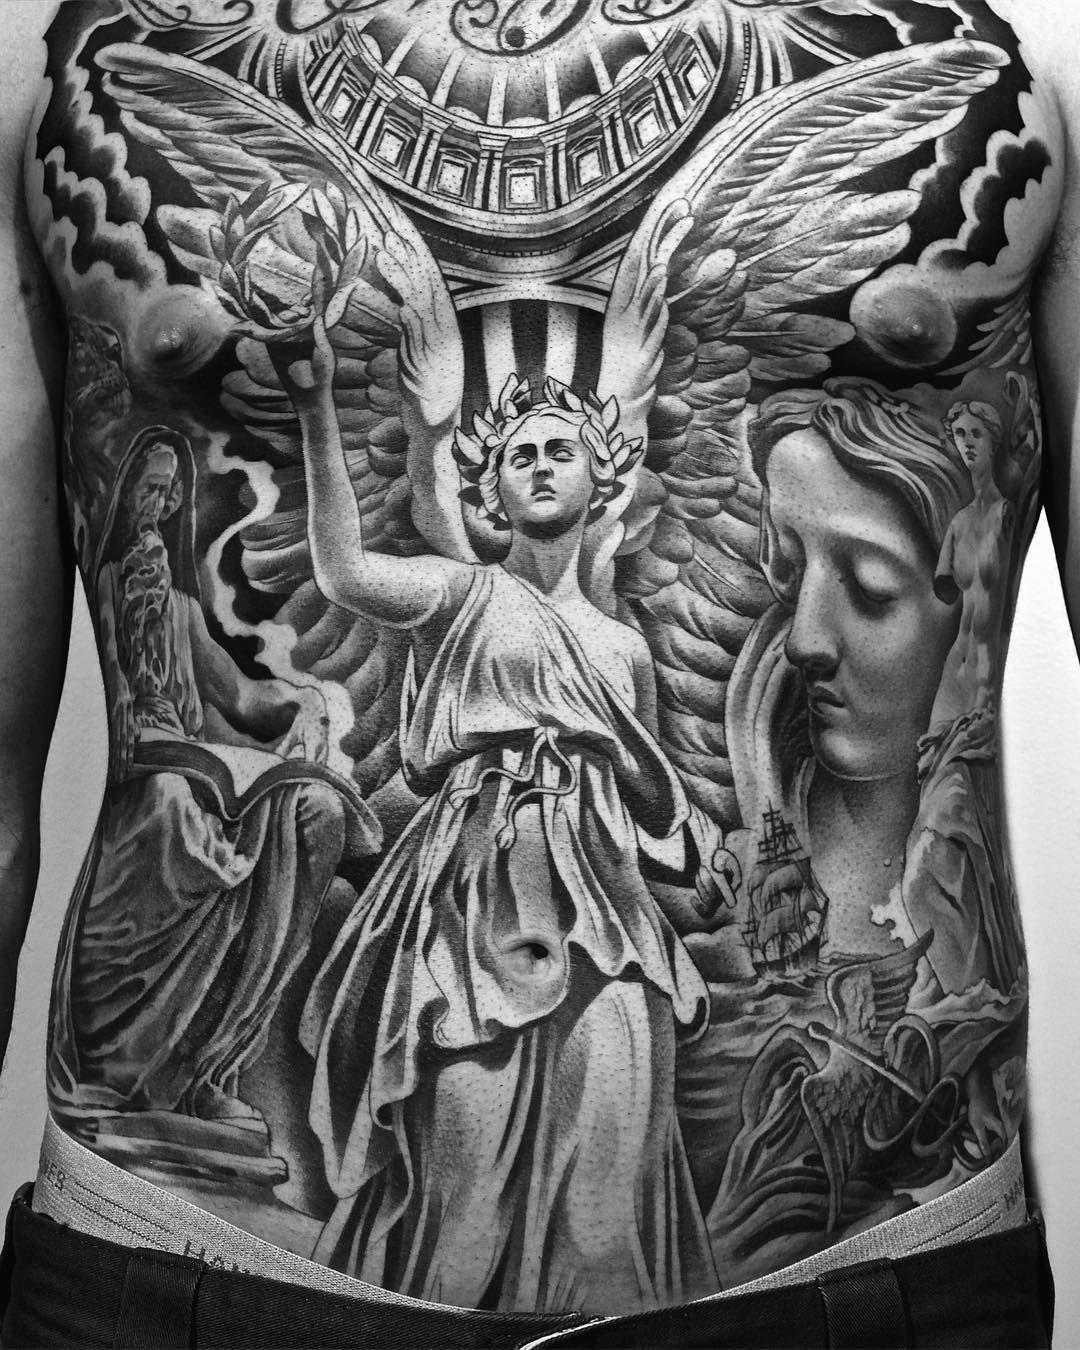 Best tattoo in the world art ink cool tattoos gangsta